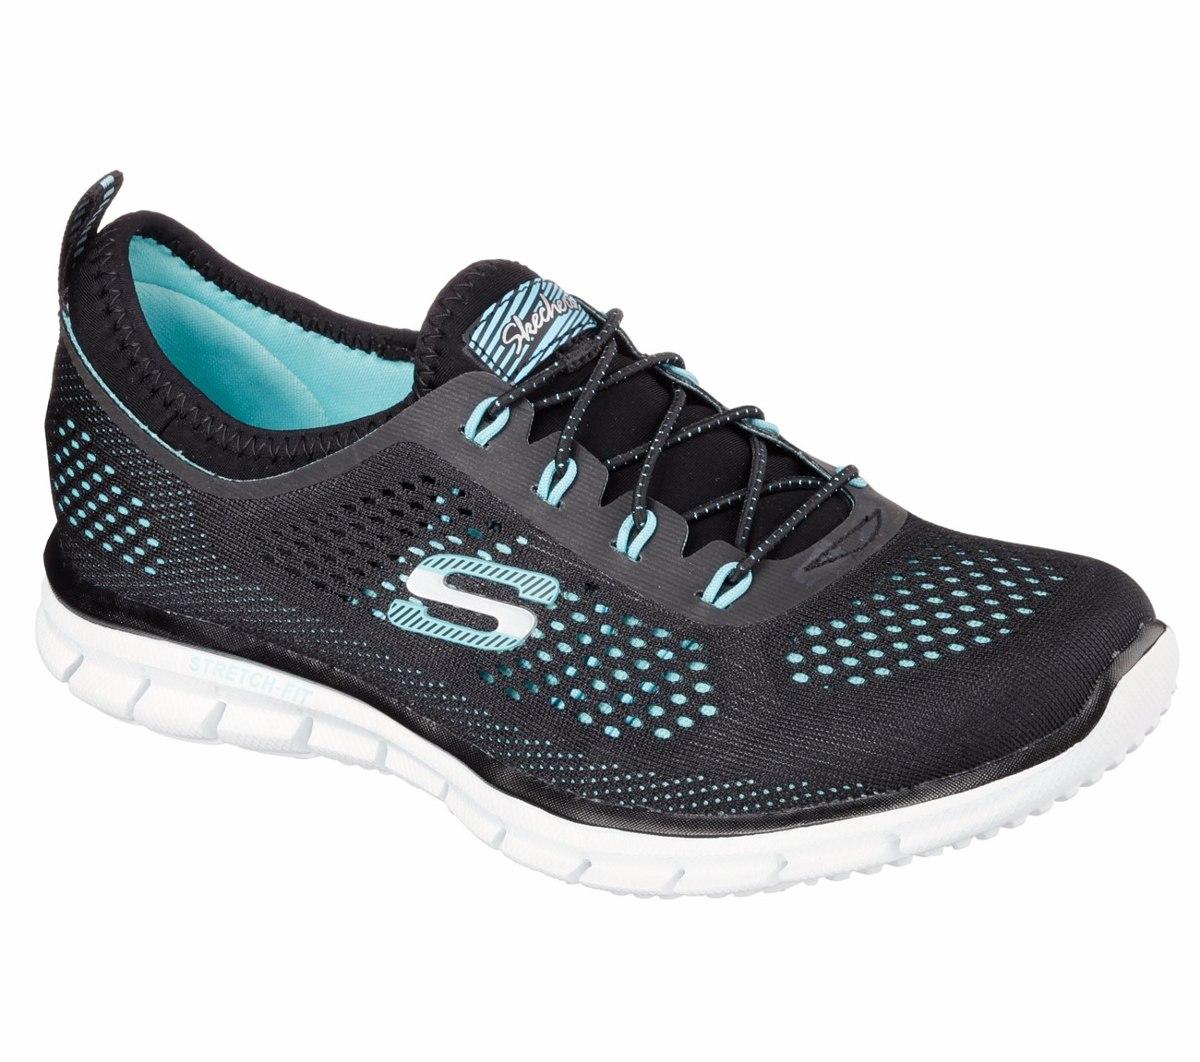 Zapatos Skechers Flex Appeal para mujer P691vM6L